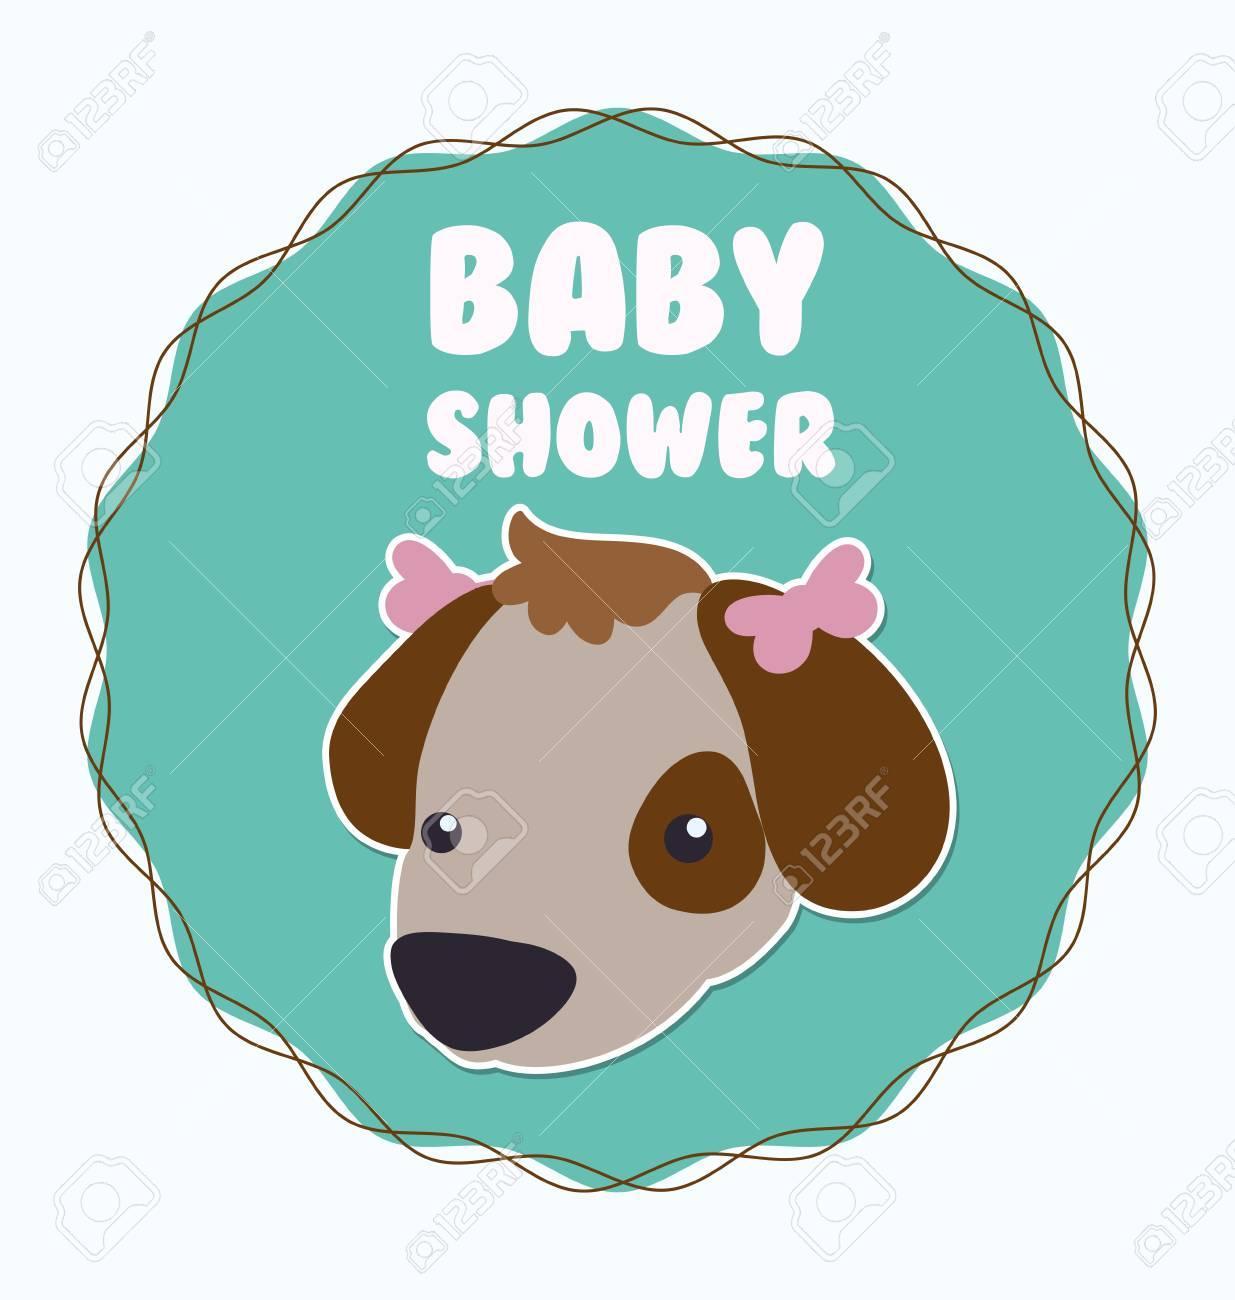 Baby Shower Invitation Card Graphic Design, Vector Illustration ...